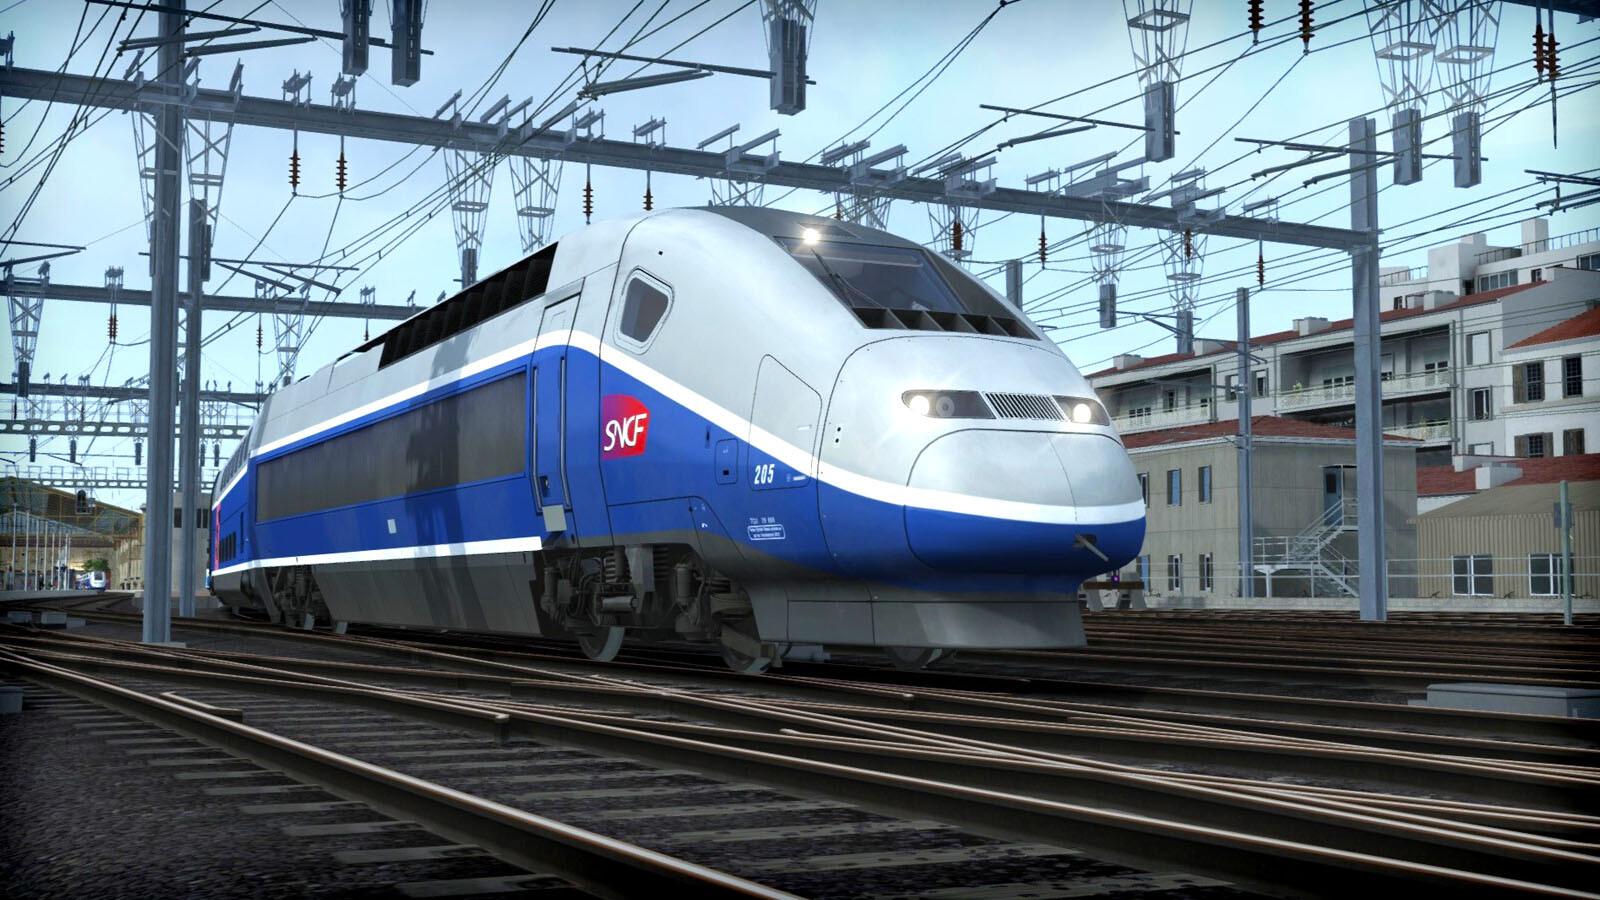 Train Simulator 2017 [Steam CD Key] for PC - Buy now